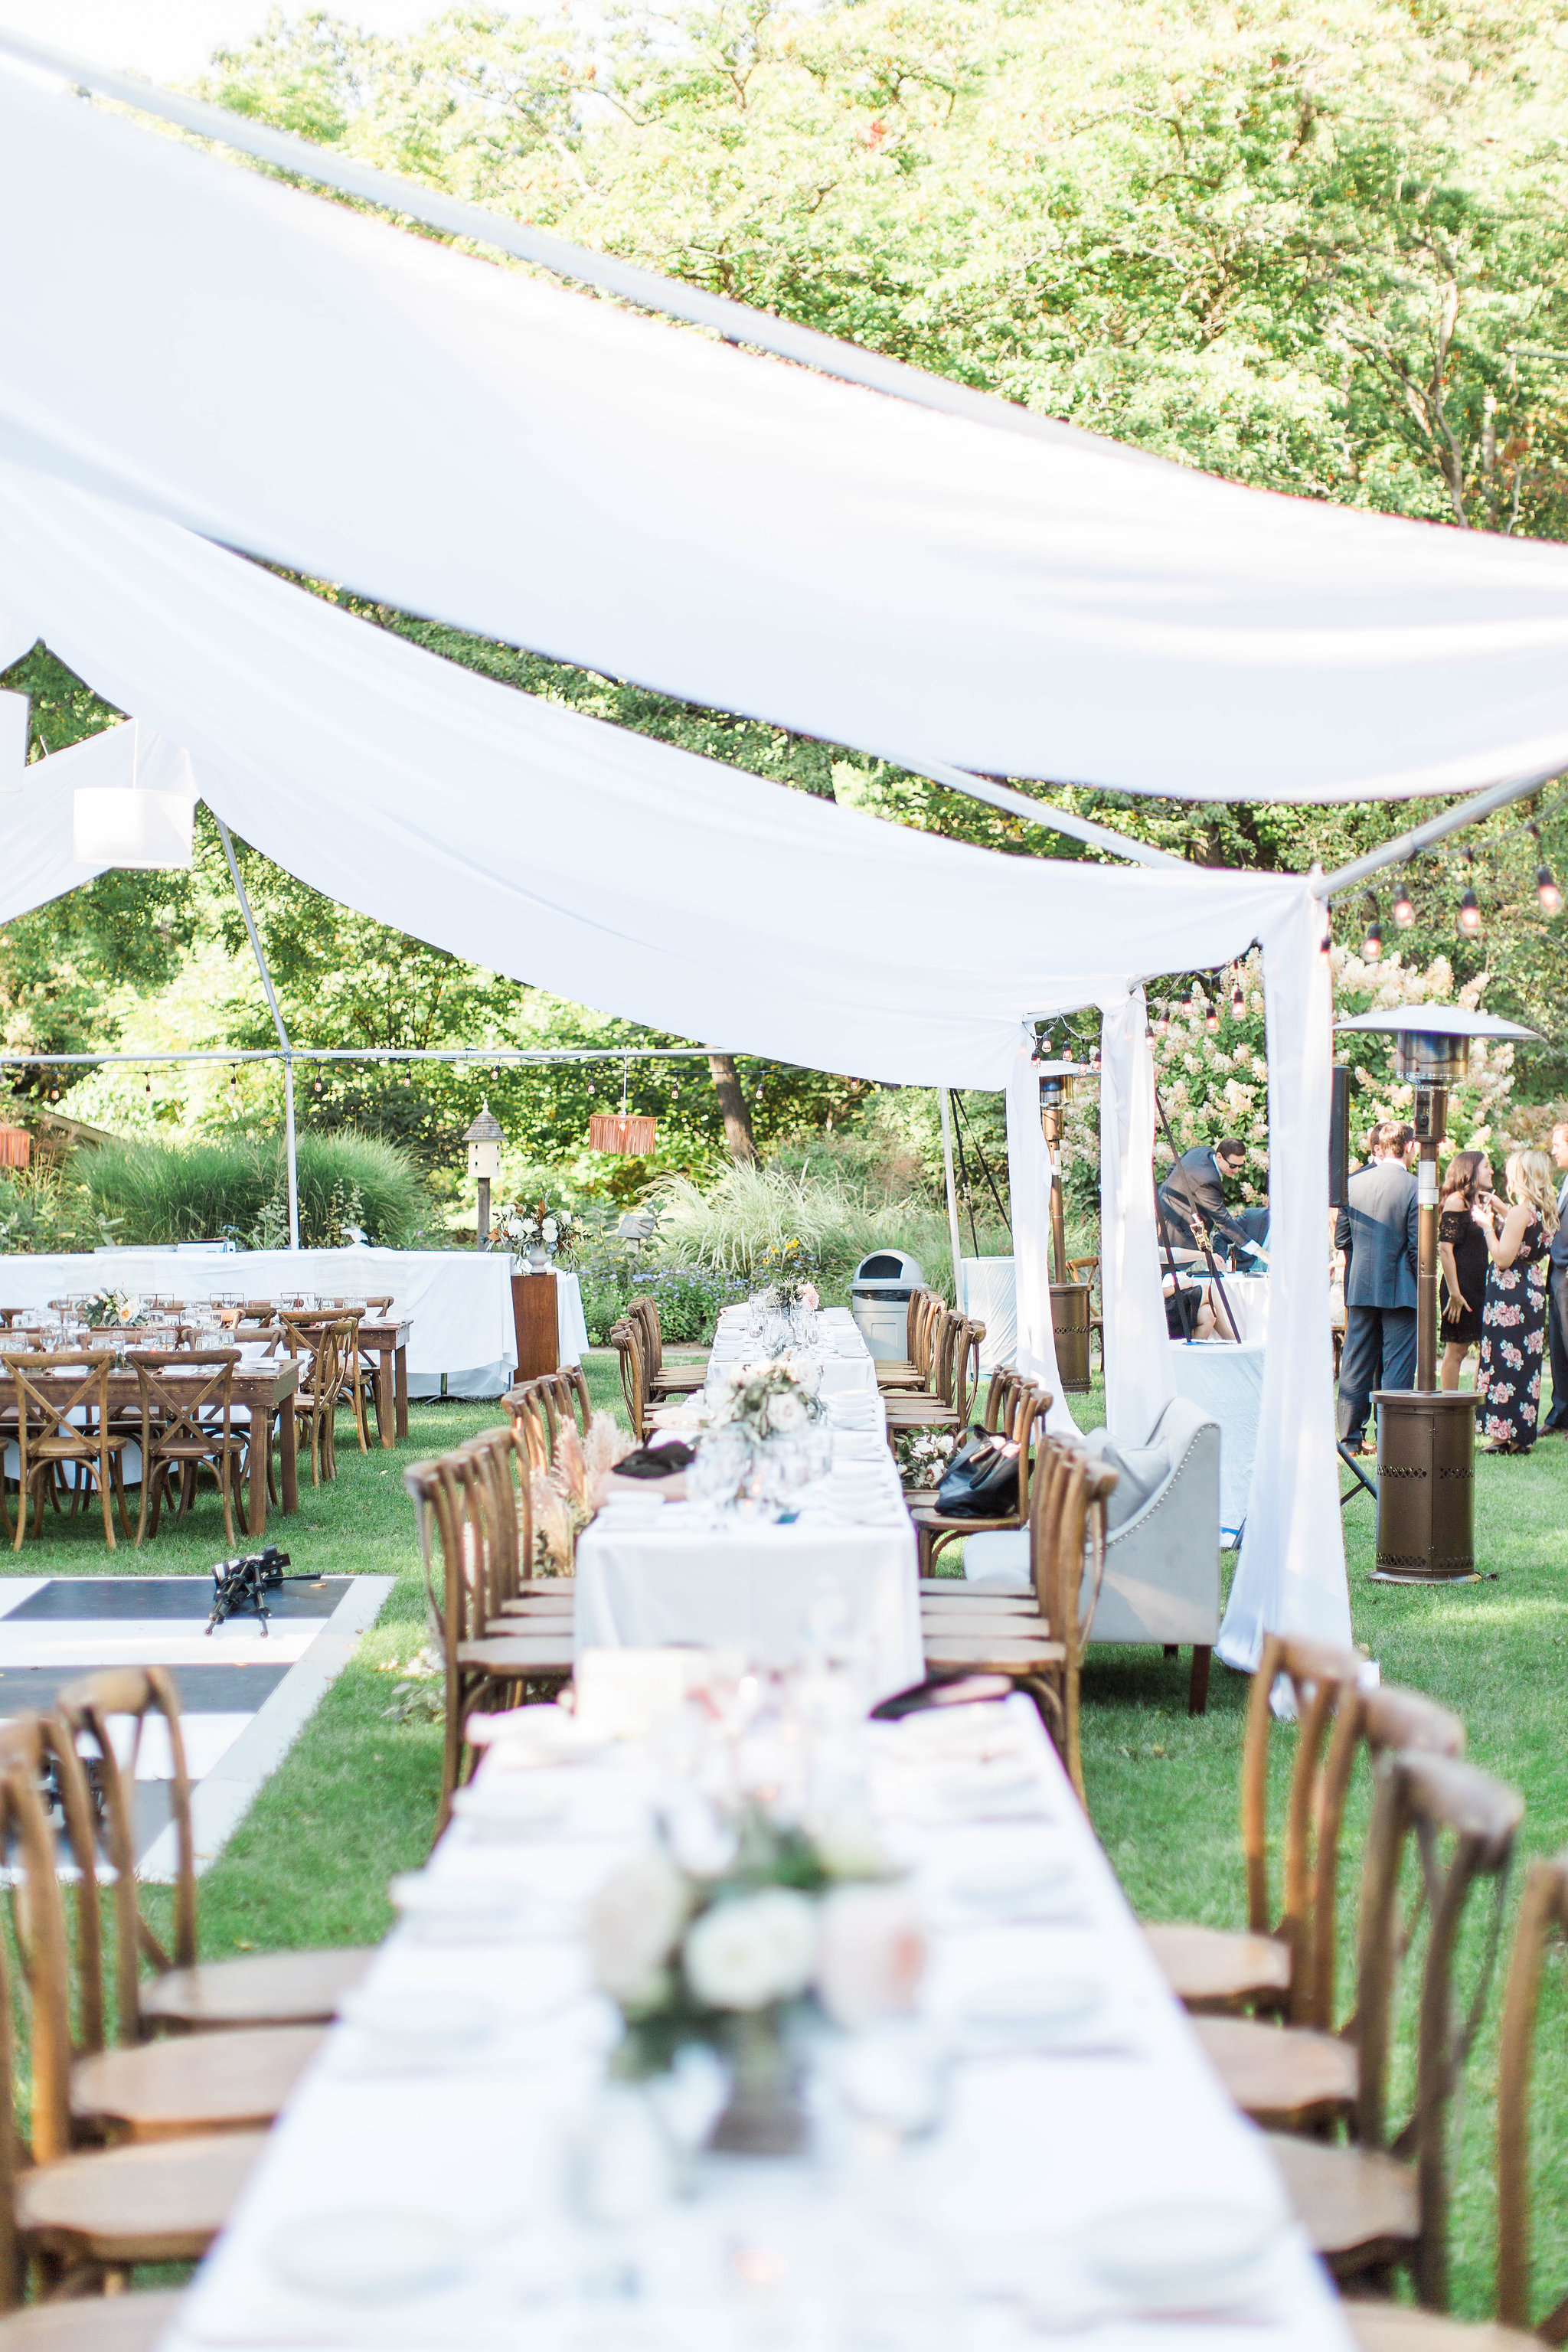 Fernwood Botanical Garden tented wedding reception